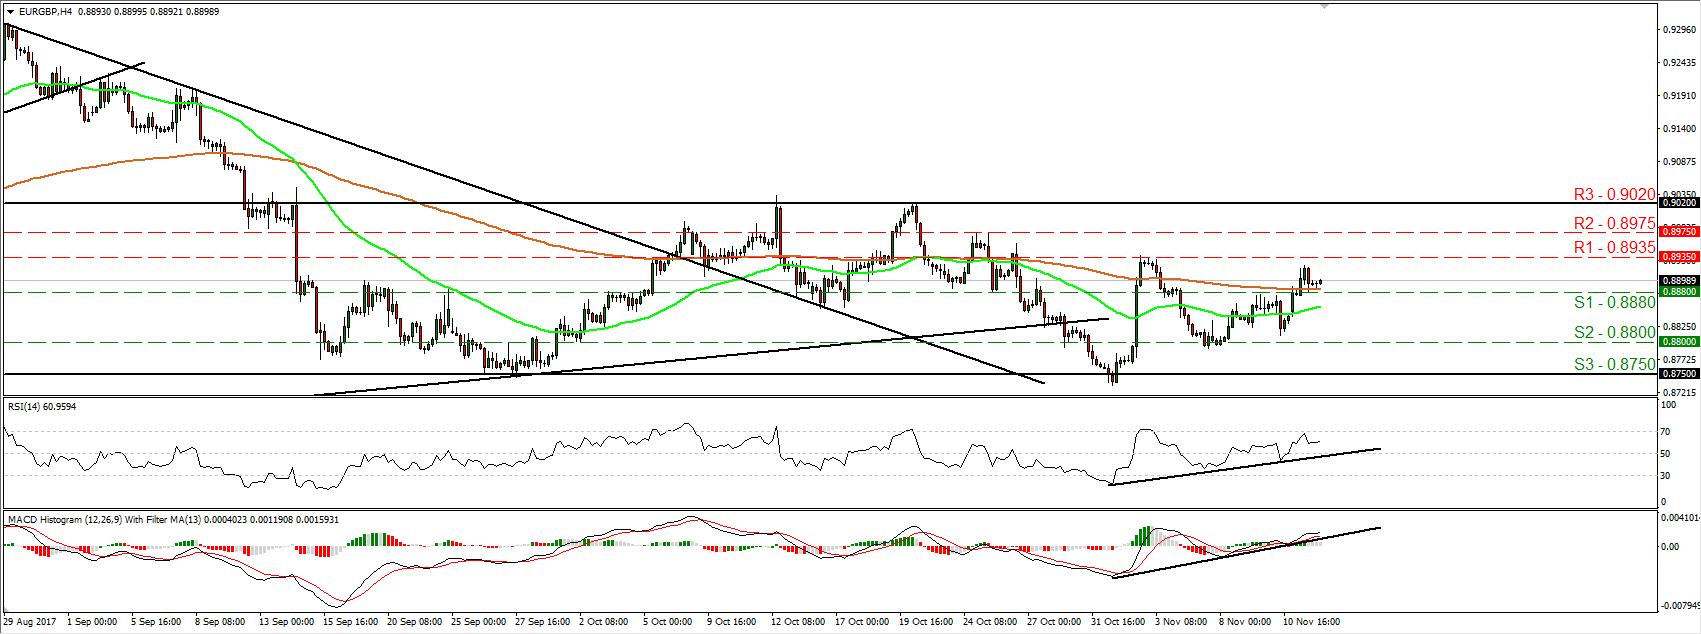 EUR/GBP 14 Nov 2017 | Econ Alerts